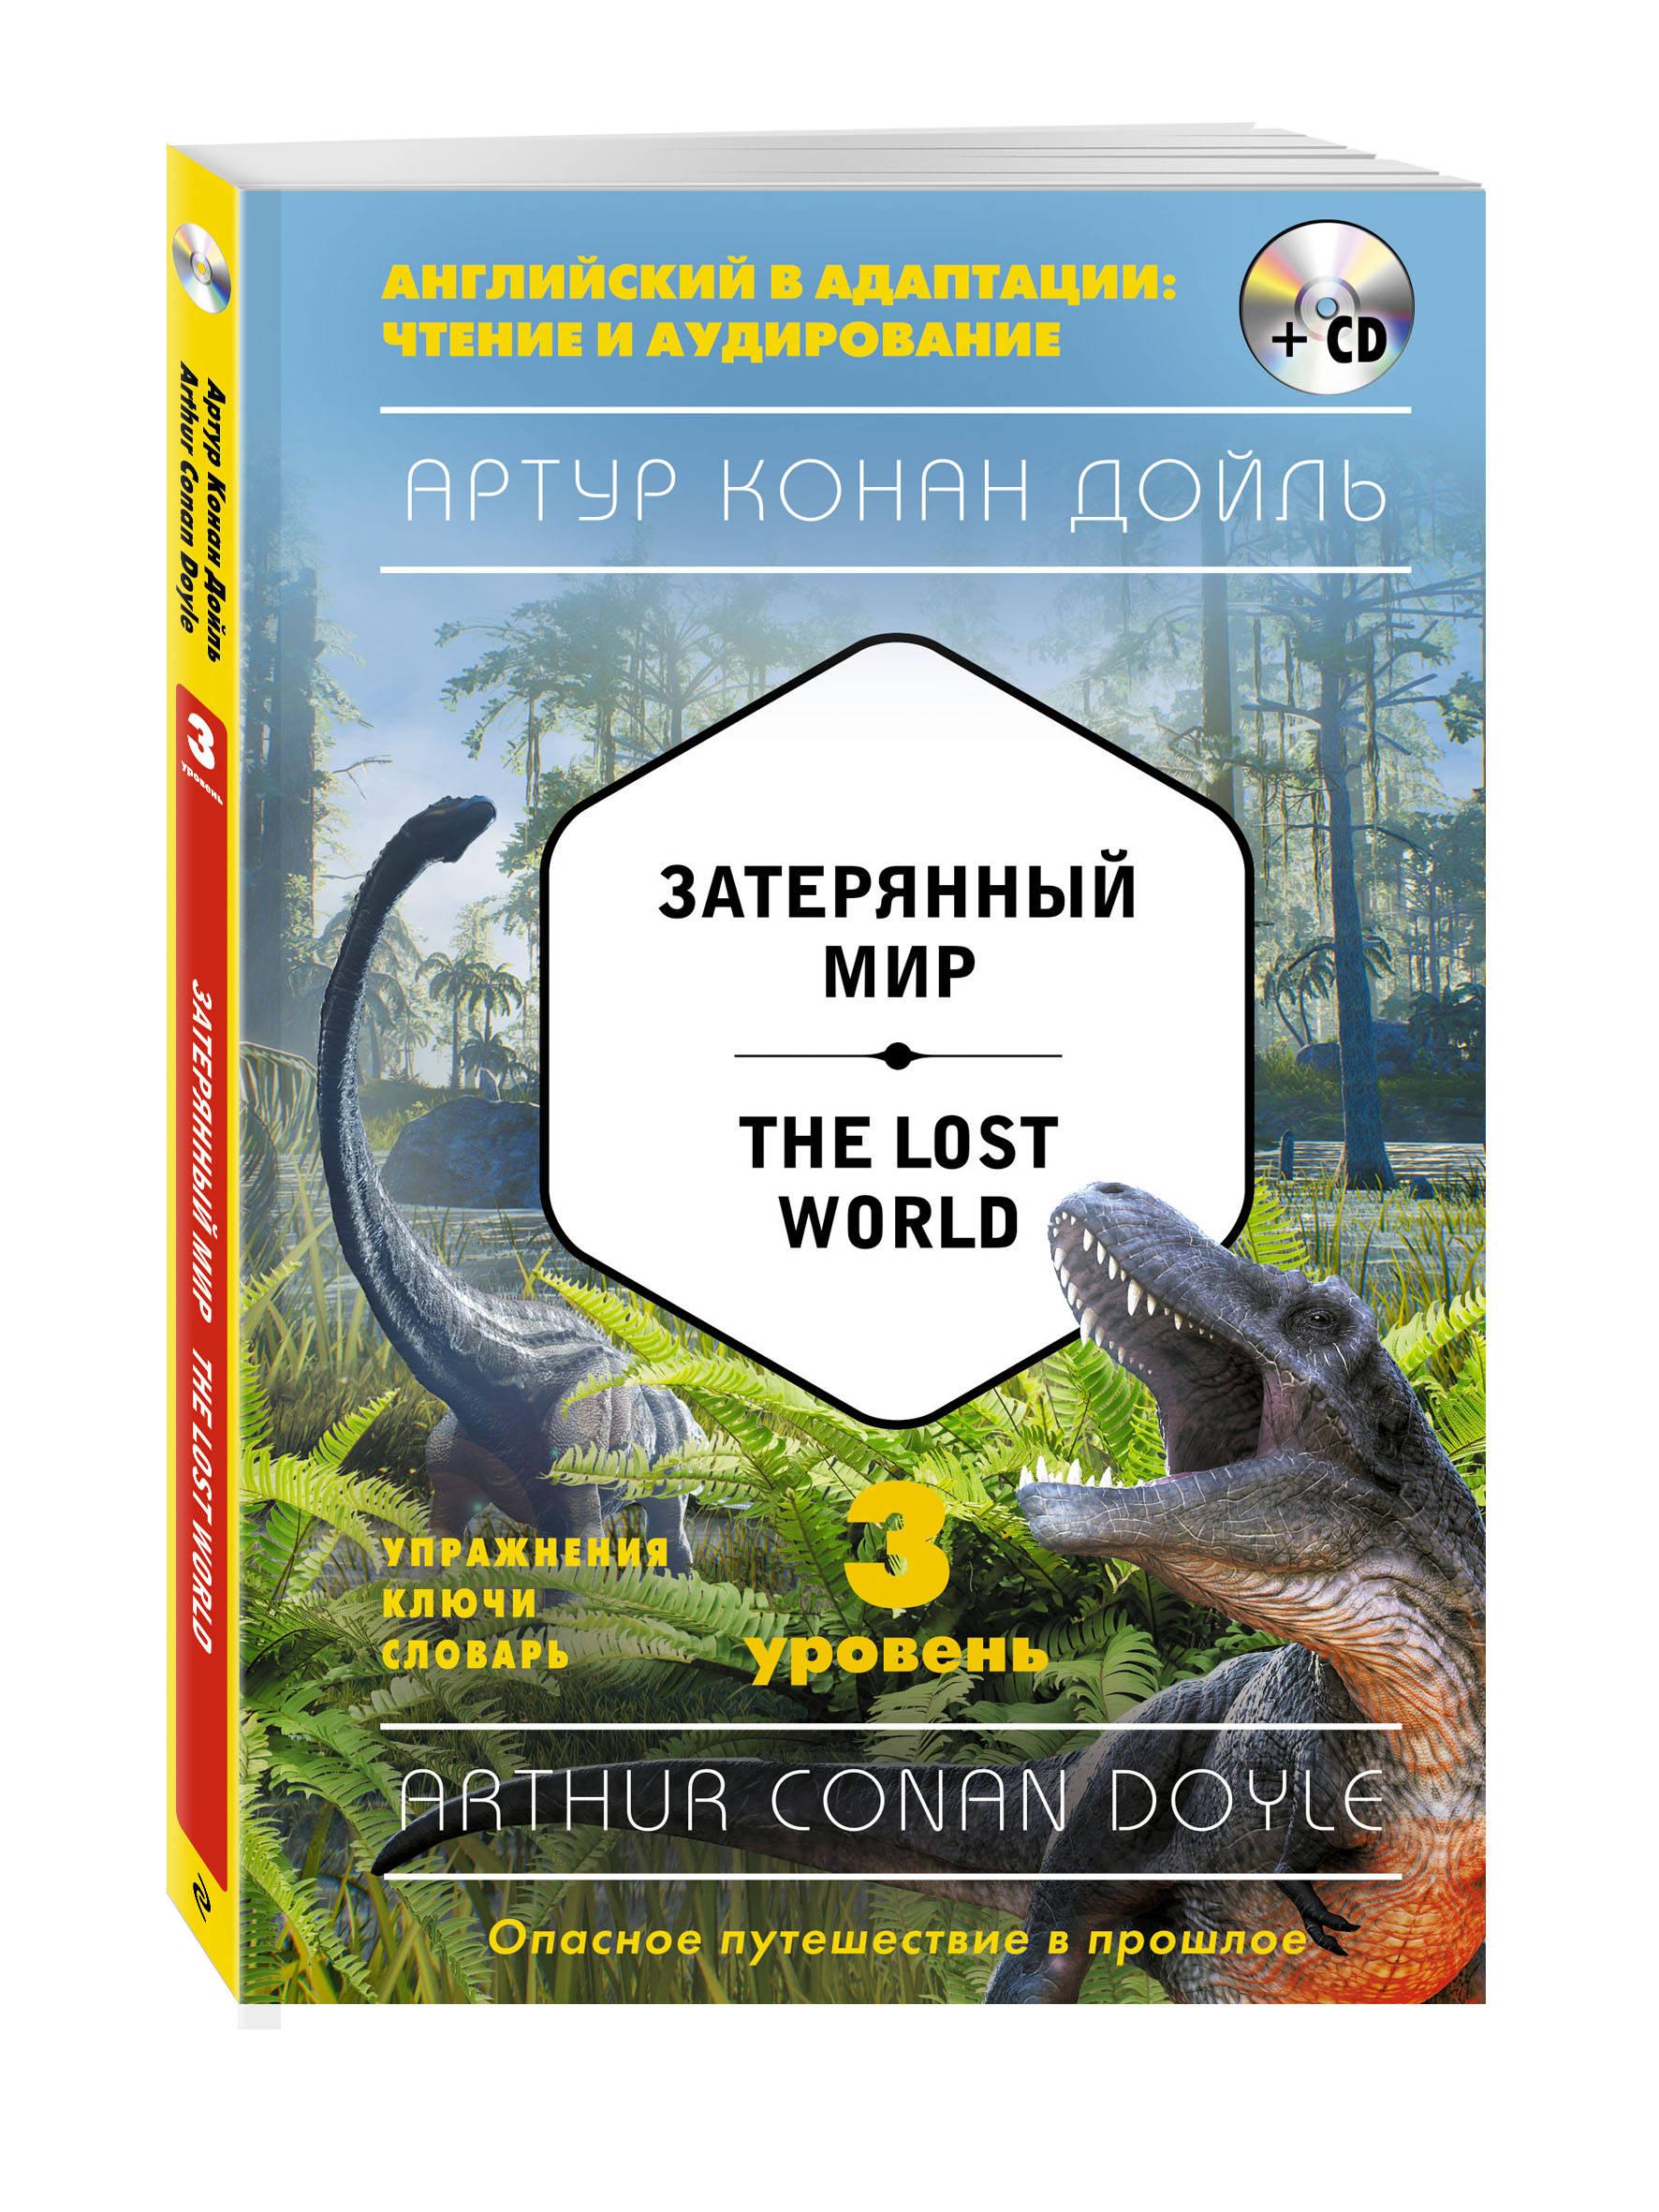 Дойл А. Затерянный мир = The Lost World (+CD). 3-й уровень leaving microsoft to change the world level 3 cd